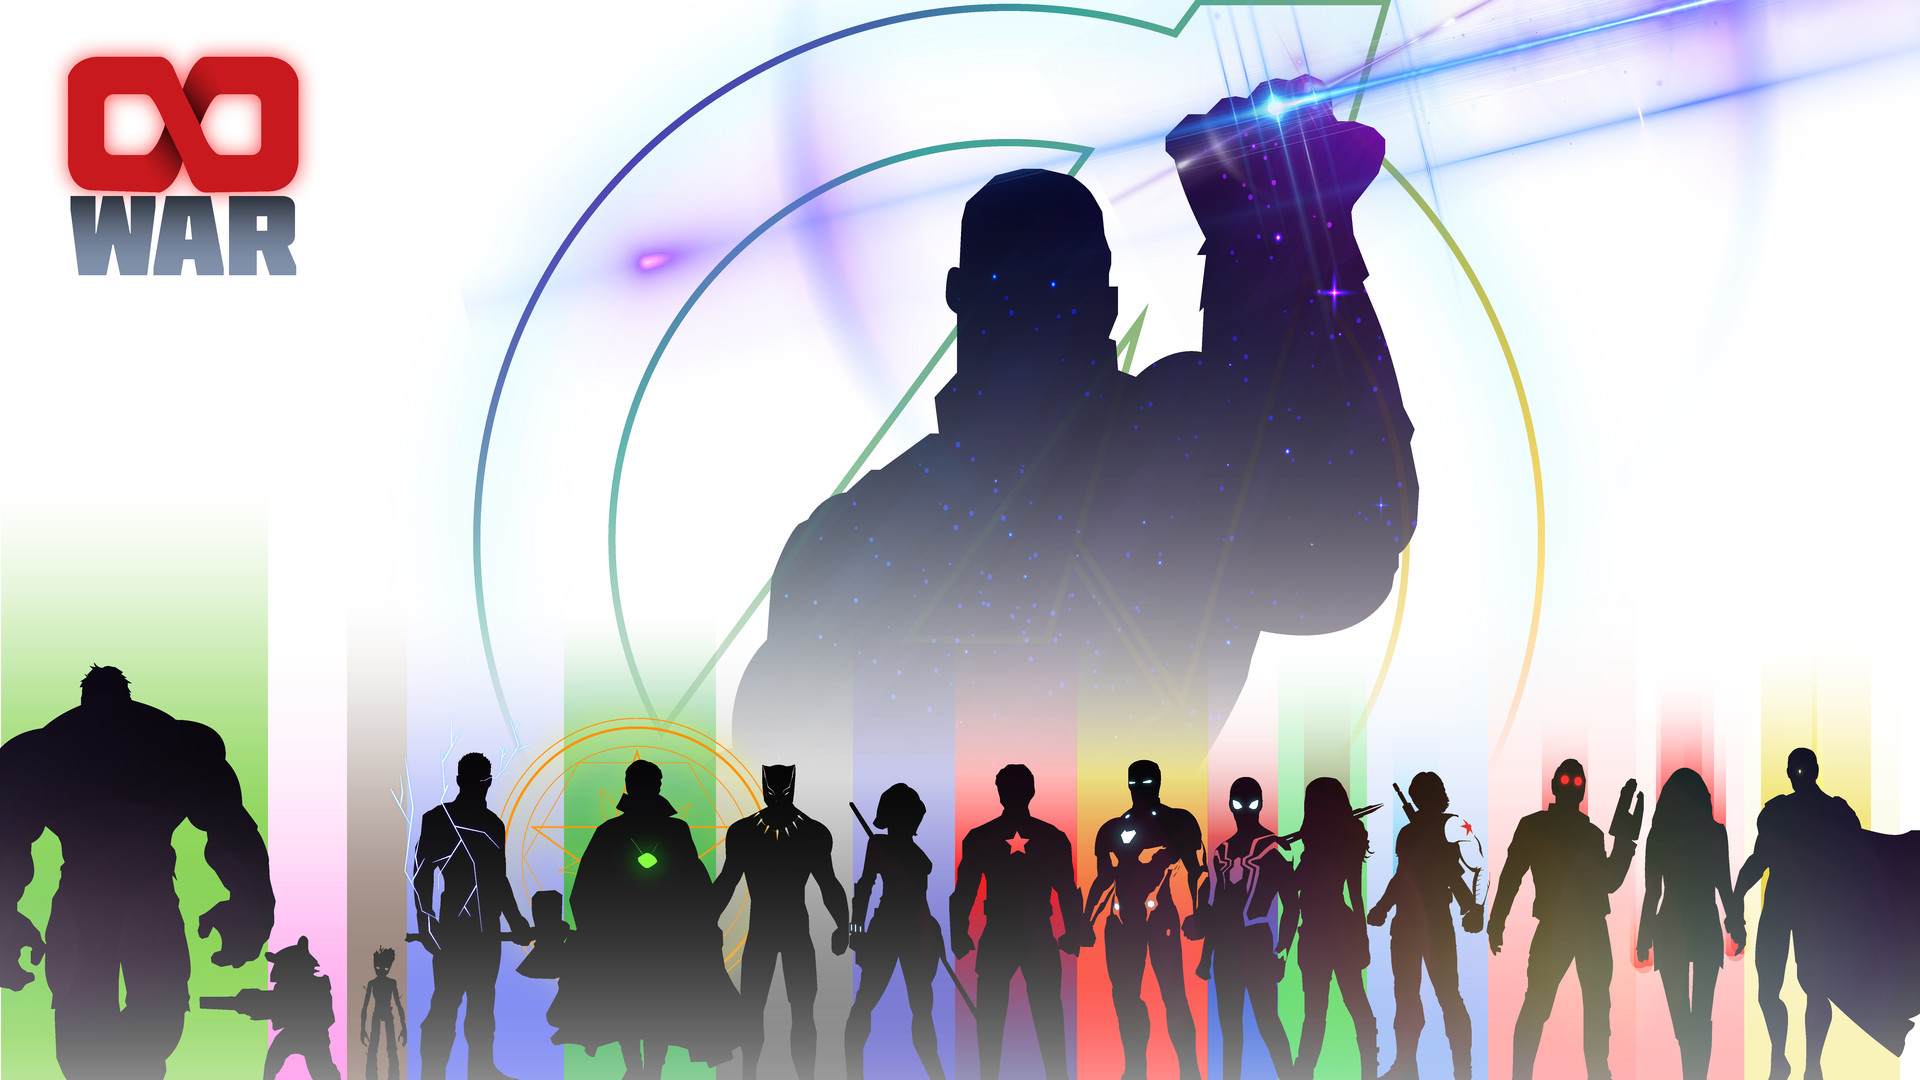 Avengers infinity War фан-арт обои скачать